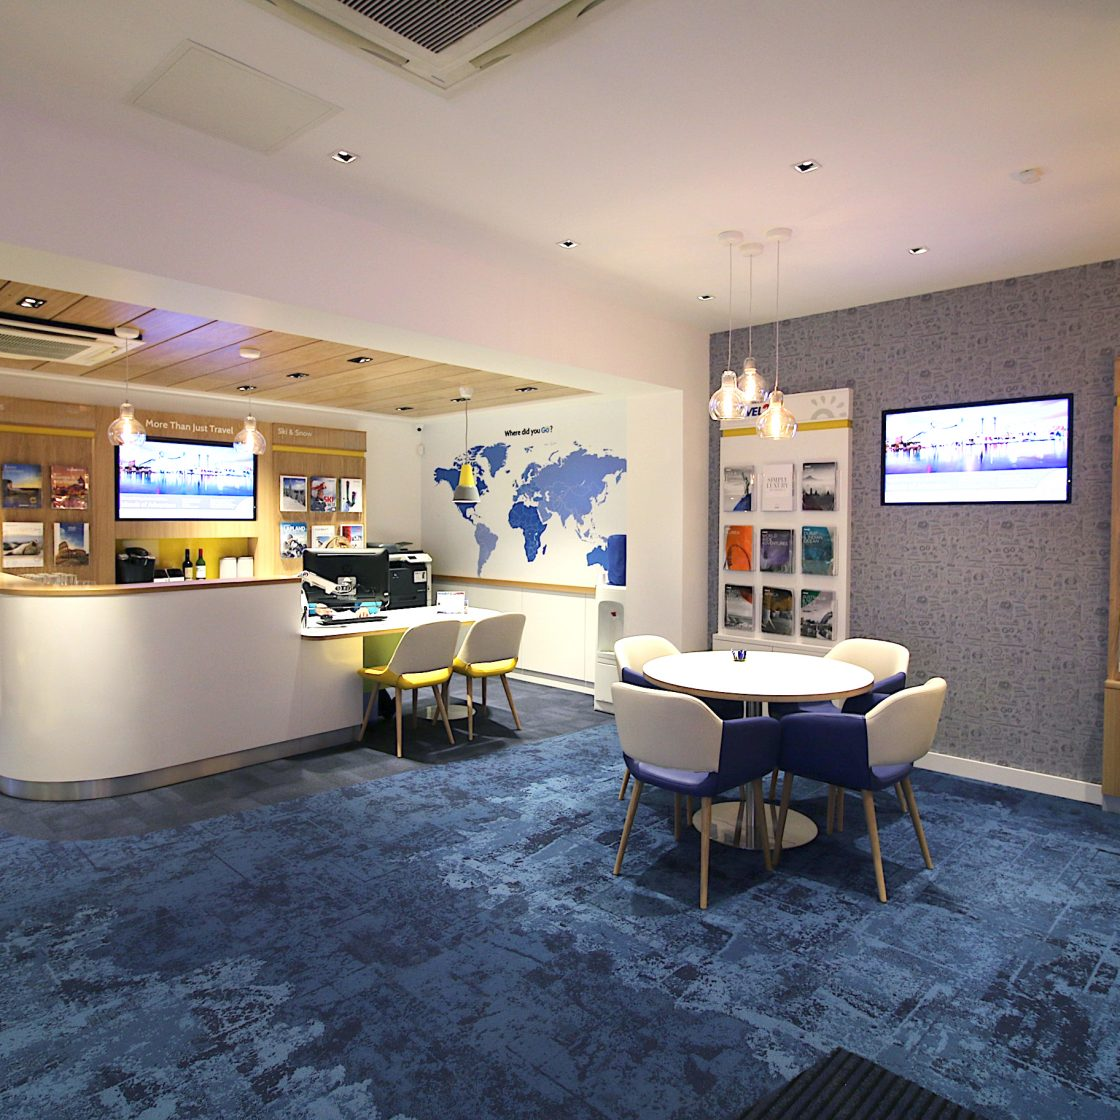 Go Travel_Chislhrust_Interior Design By Nugget Design 08